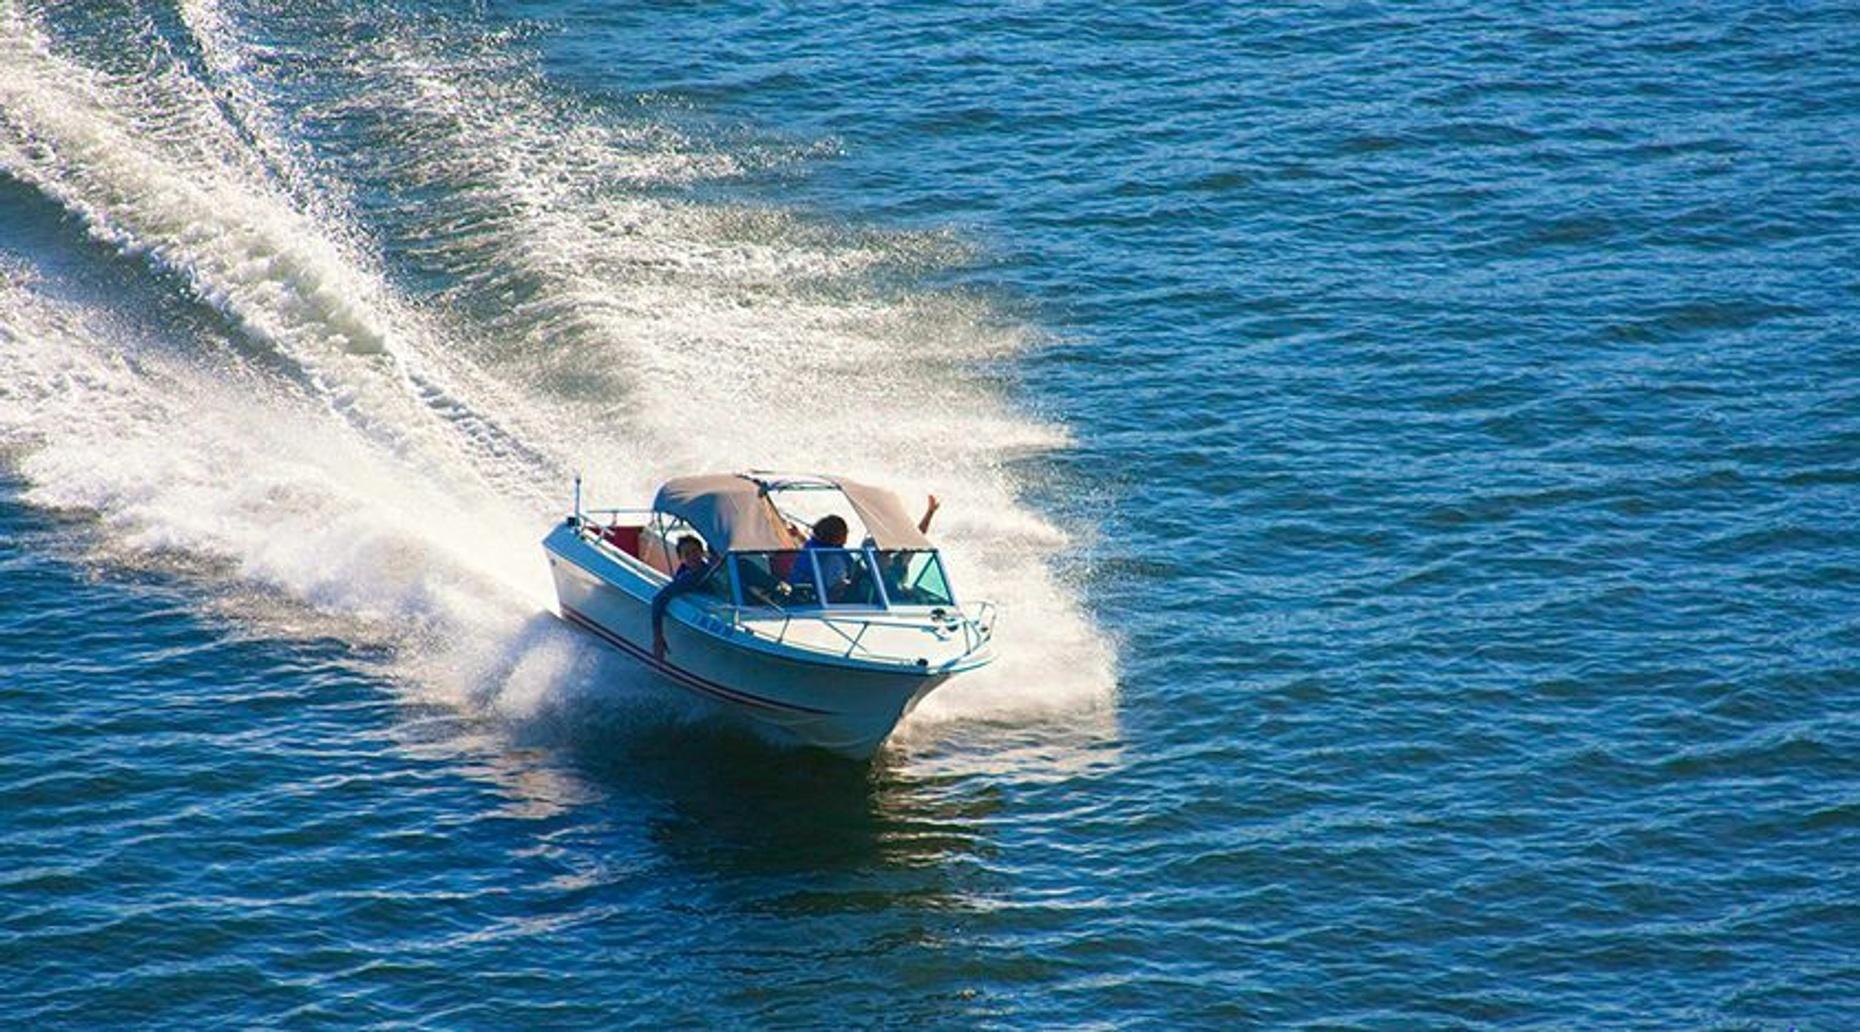 Nichupte Lagoon Speedboat Tour from Cancun